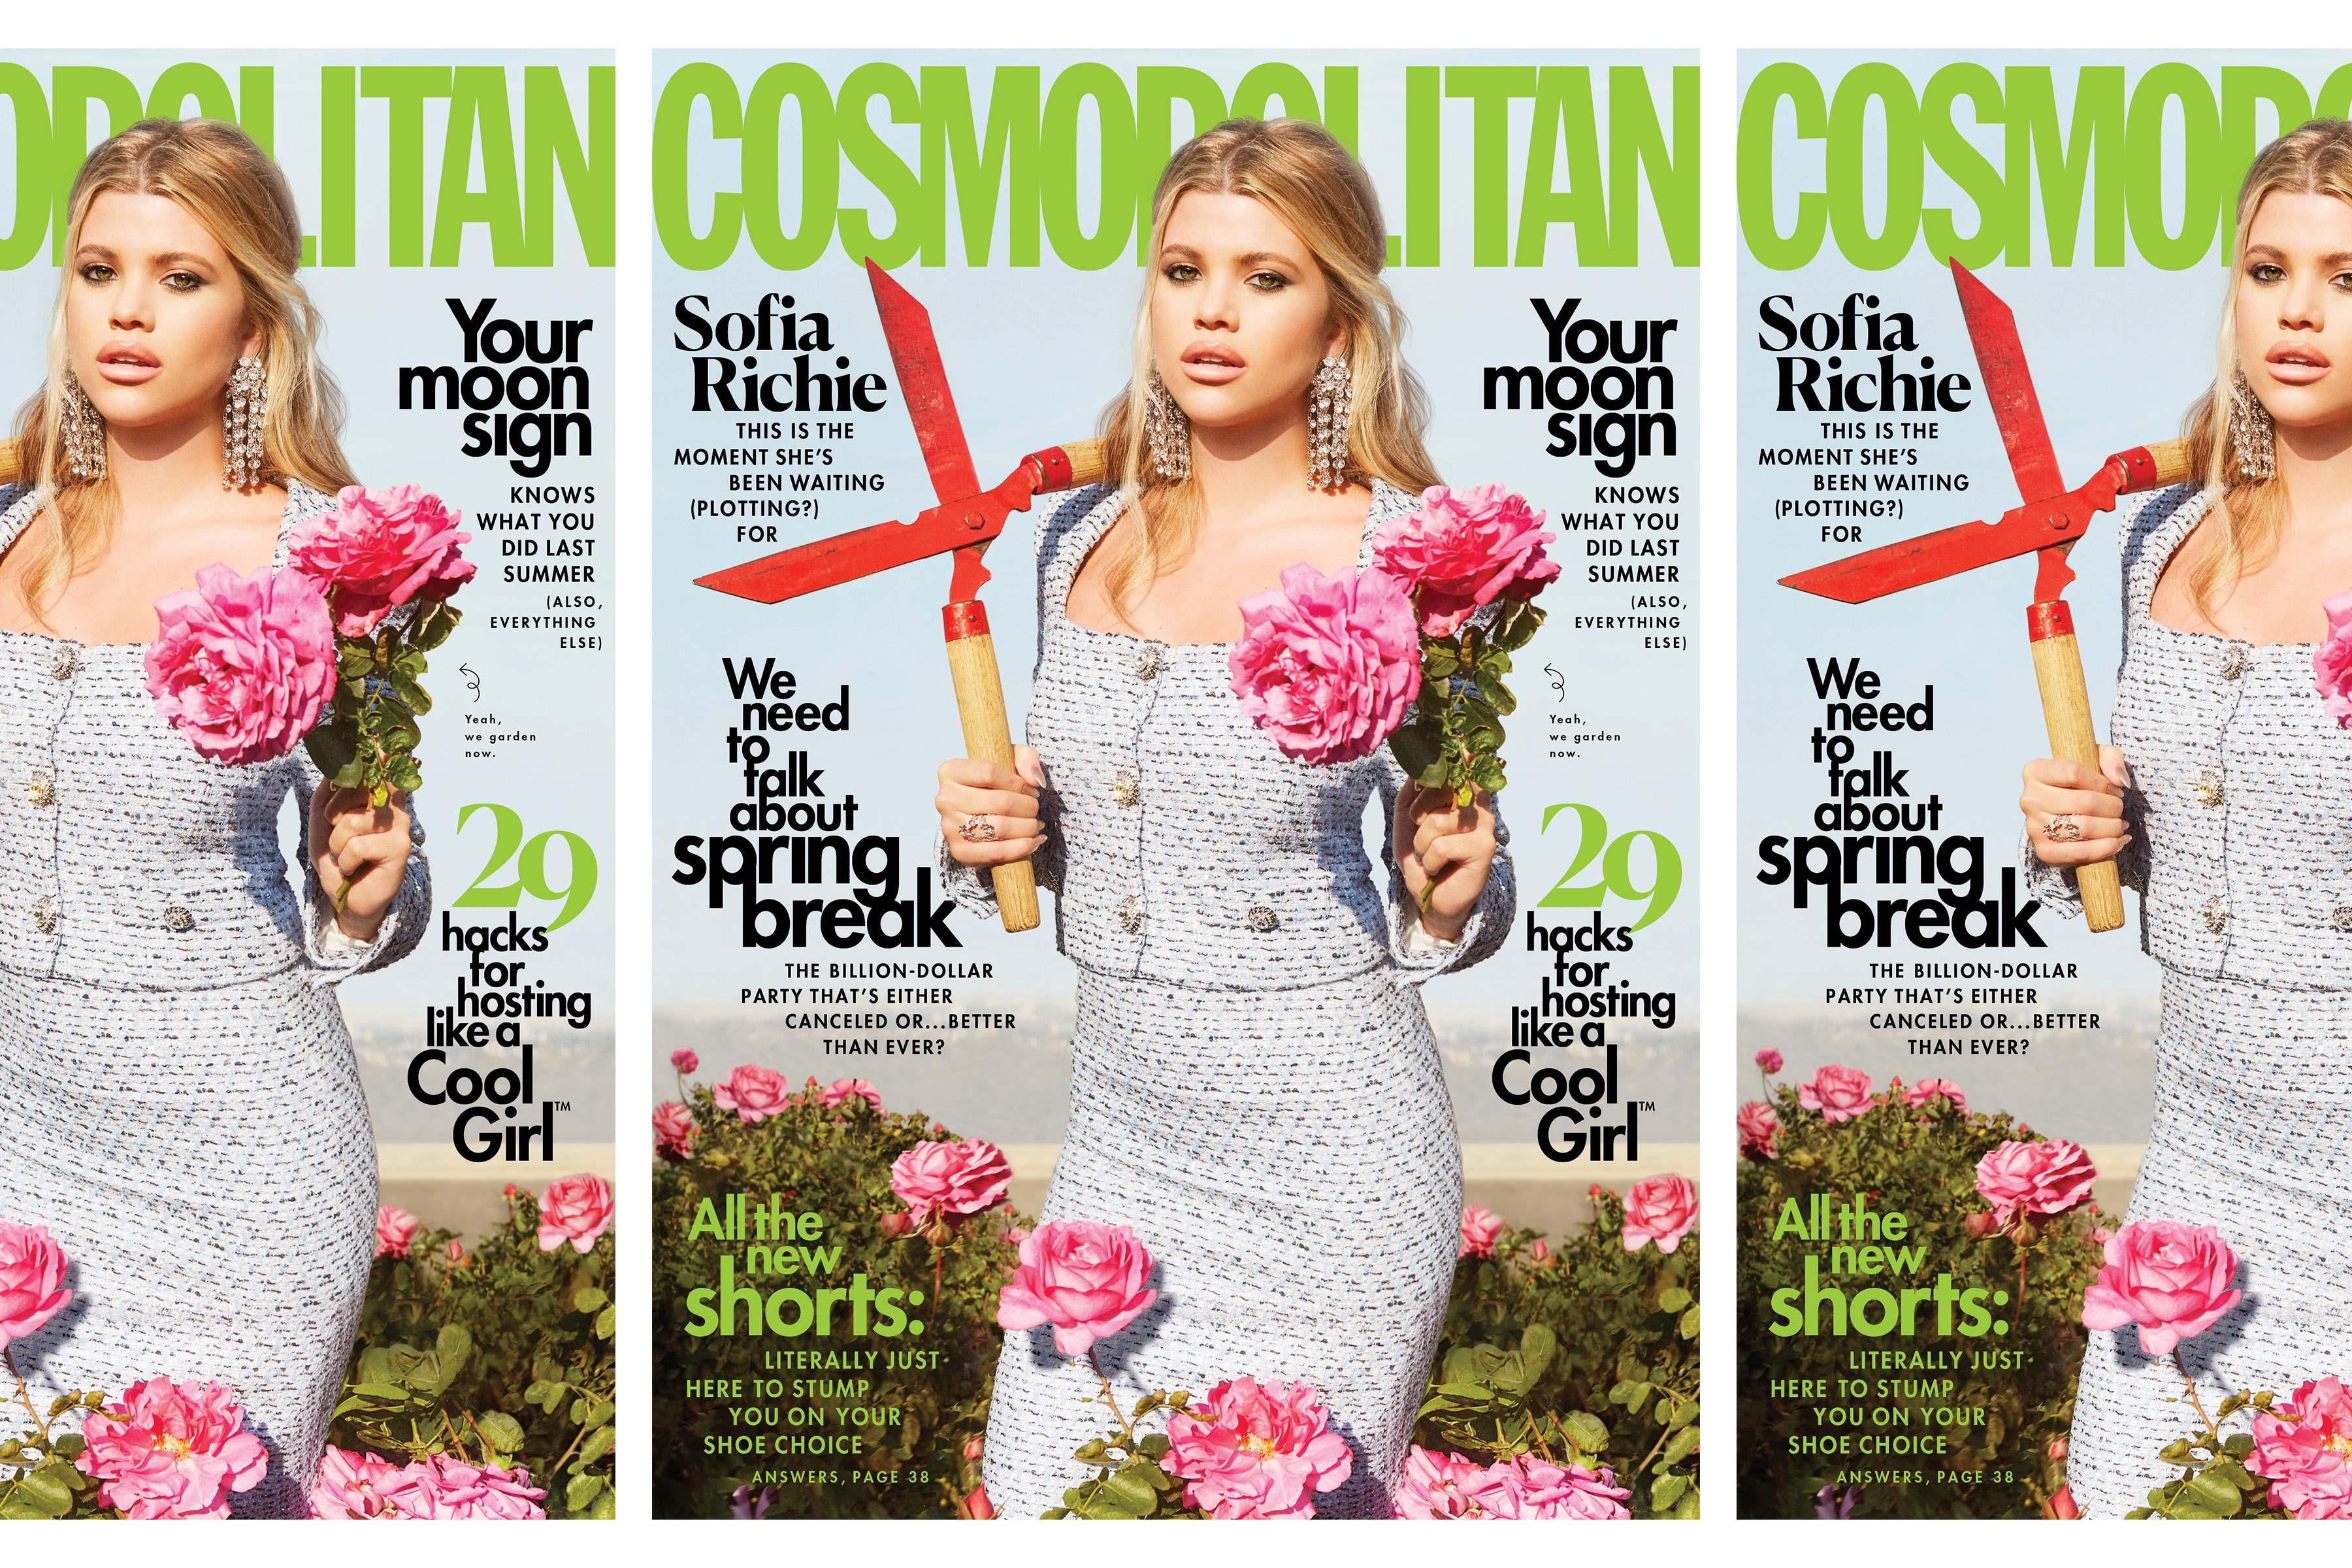 Sophia Richie on the cover of Cosmopolitan Magazine.